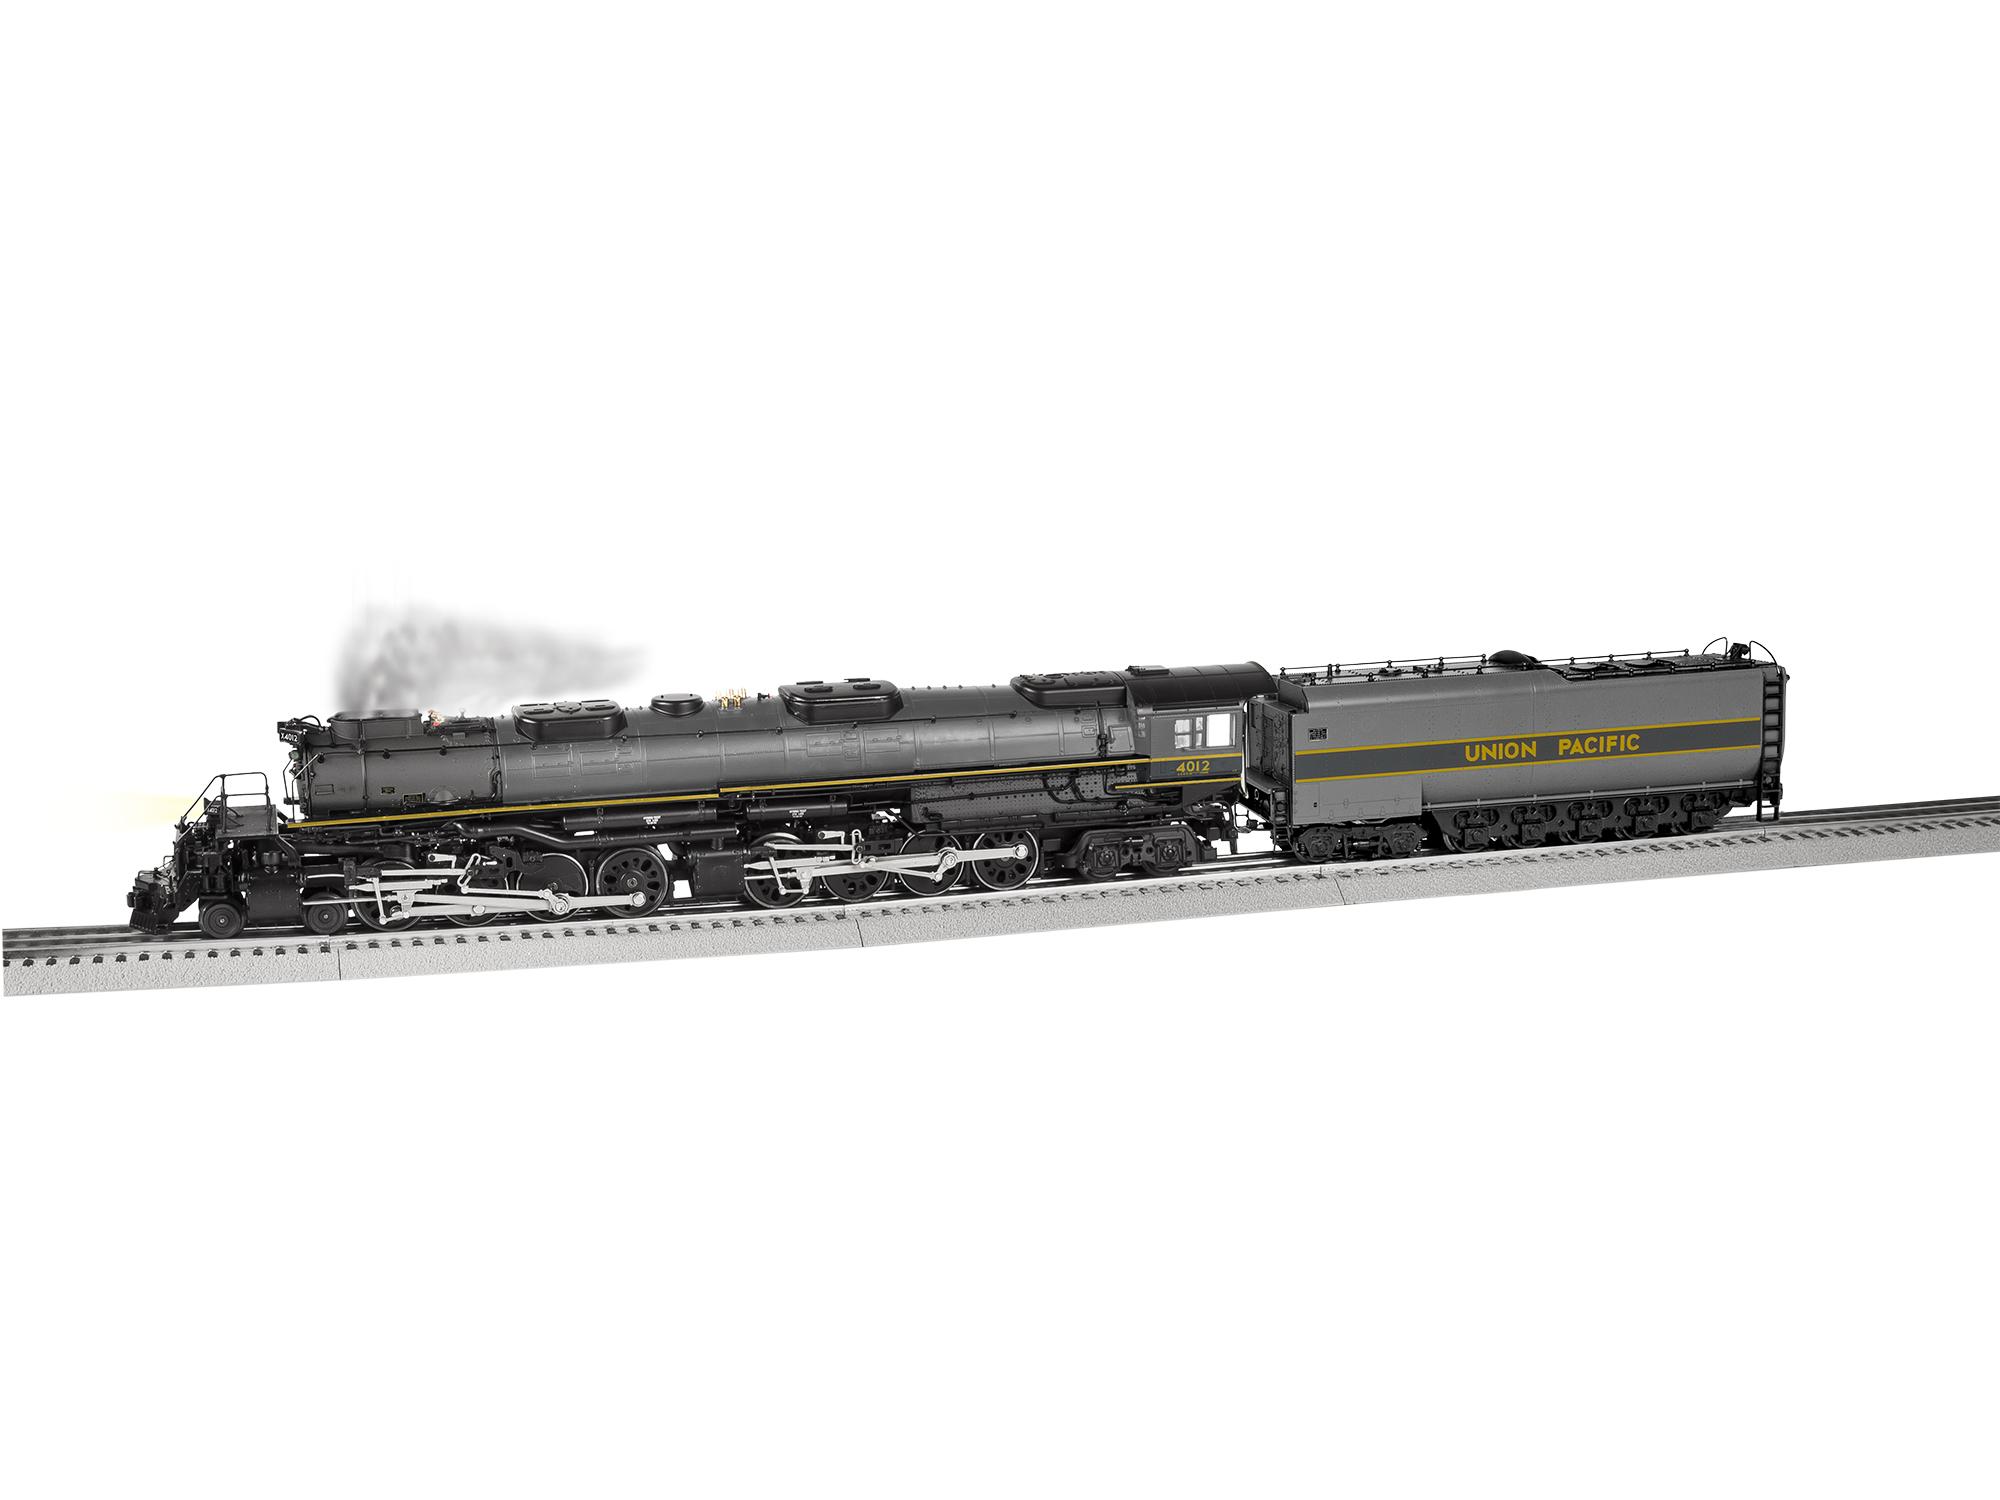 Lionel 2031263 O 4-8-8-4 Big Boy 3-Rail Legacy Sound and Control Union Pacific 4012 434-2031263